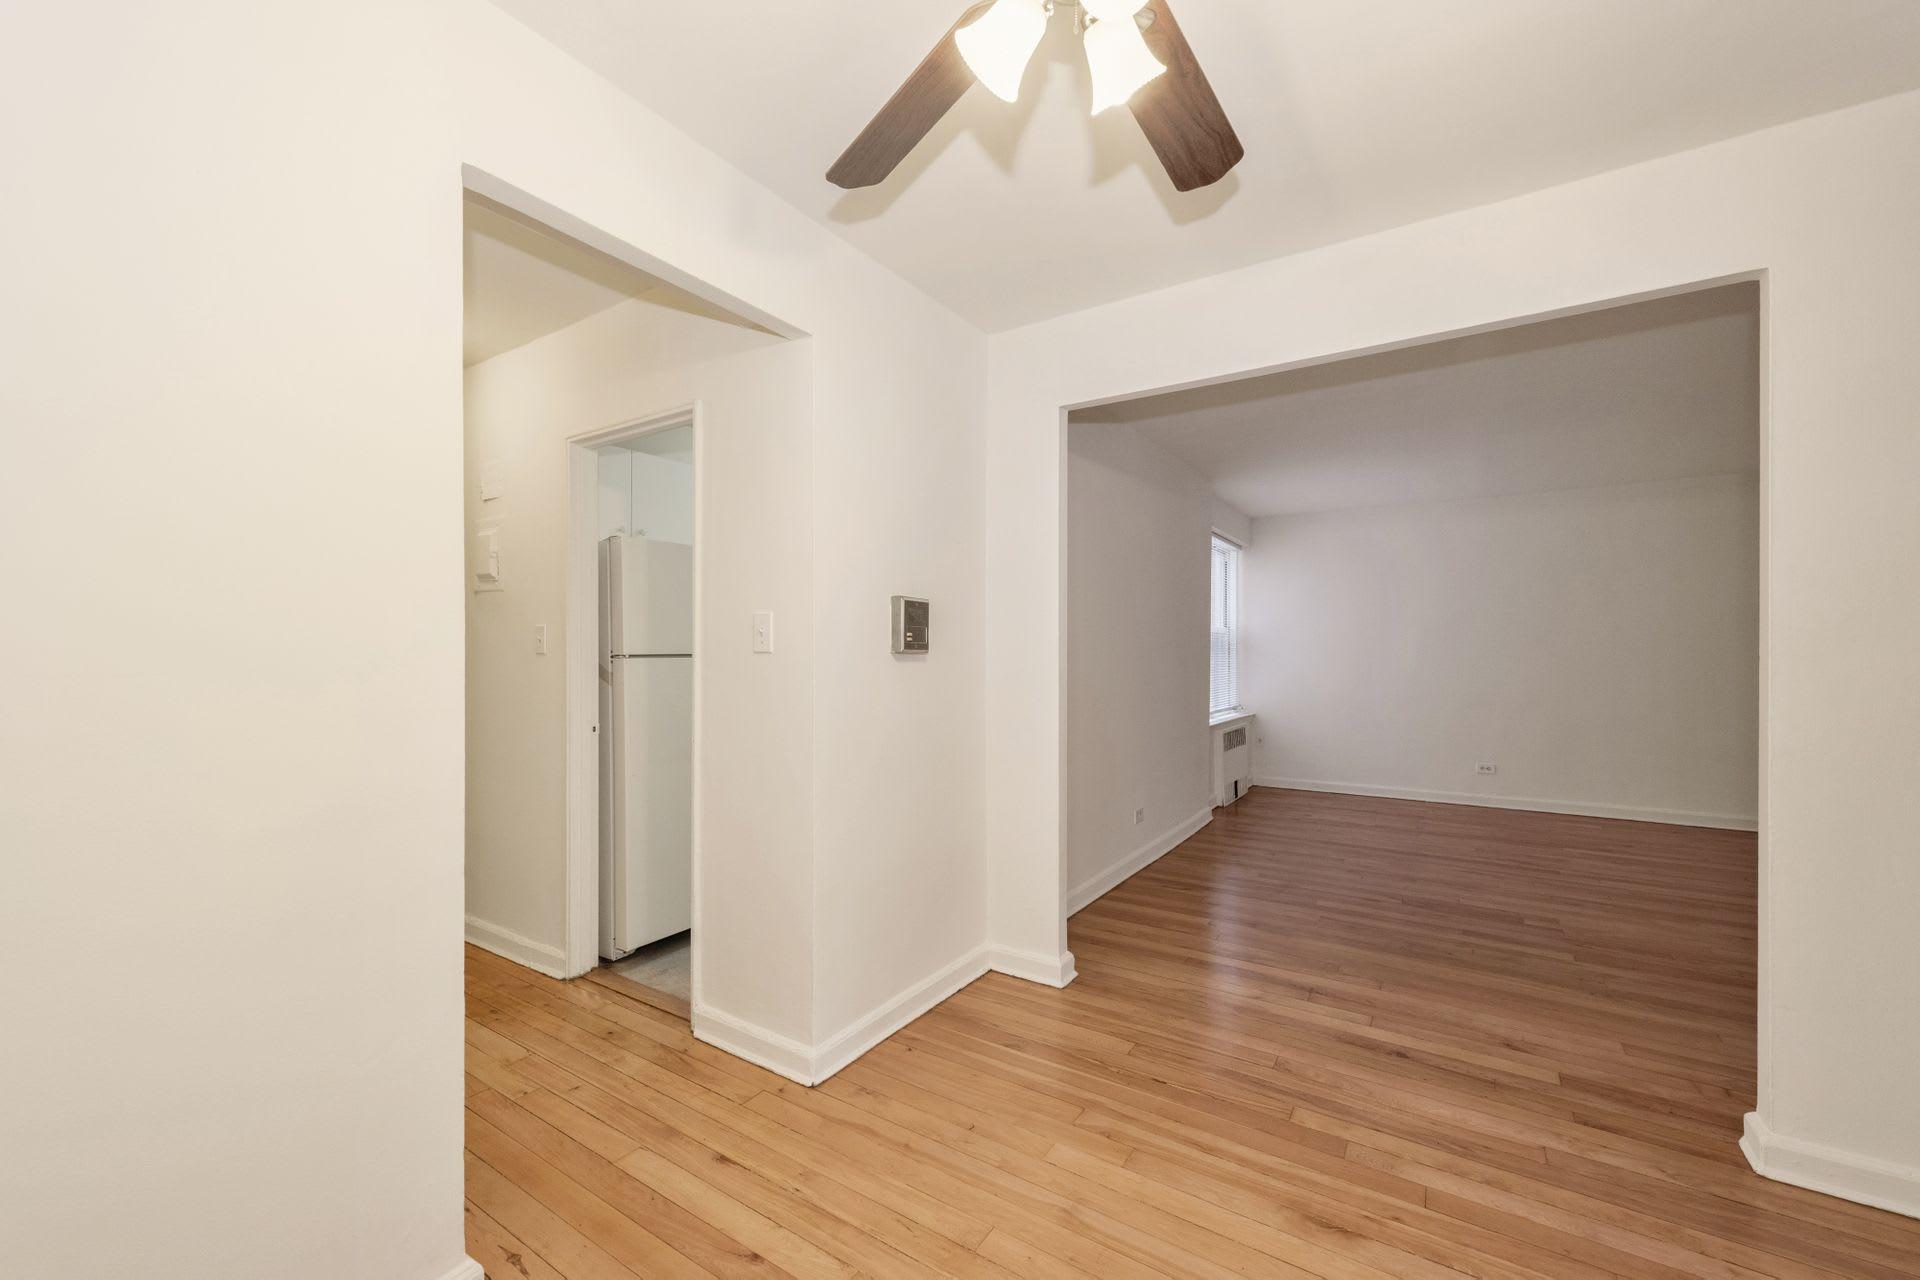 39-55 51st Street, Unit 1C photo